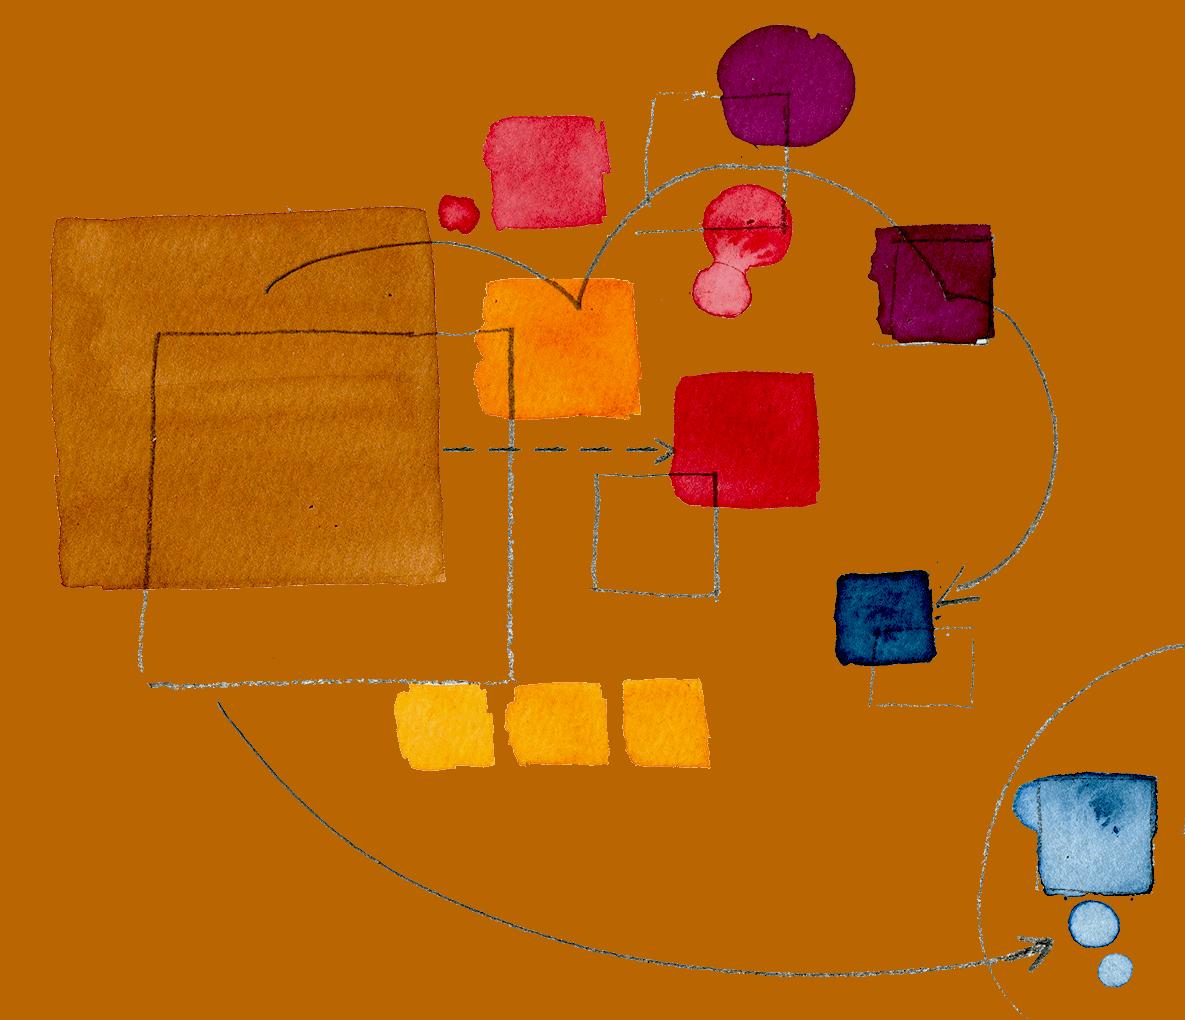 https://cdn.ttc.io/src/kit.exposingtheinvisible.org/il/Supply-Chains-Breakdown-cik-illustration.png